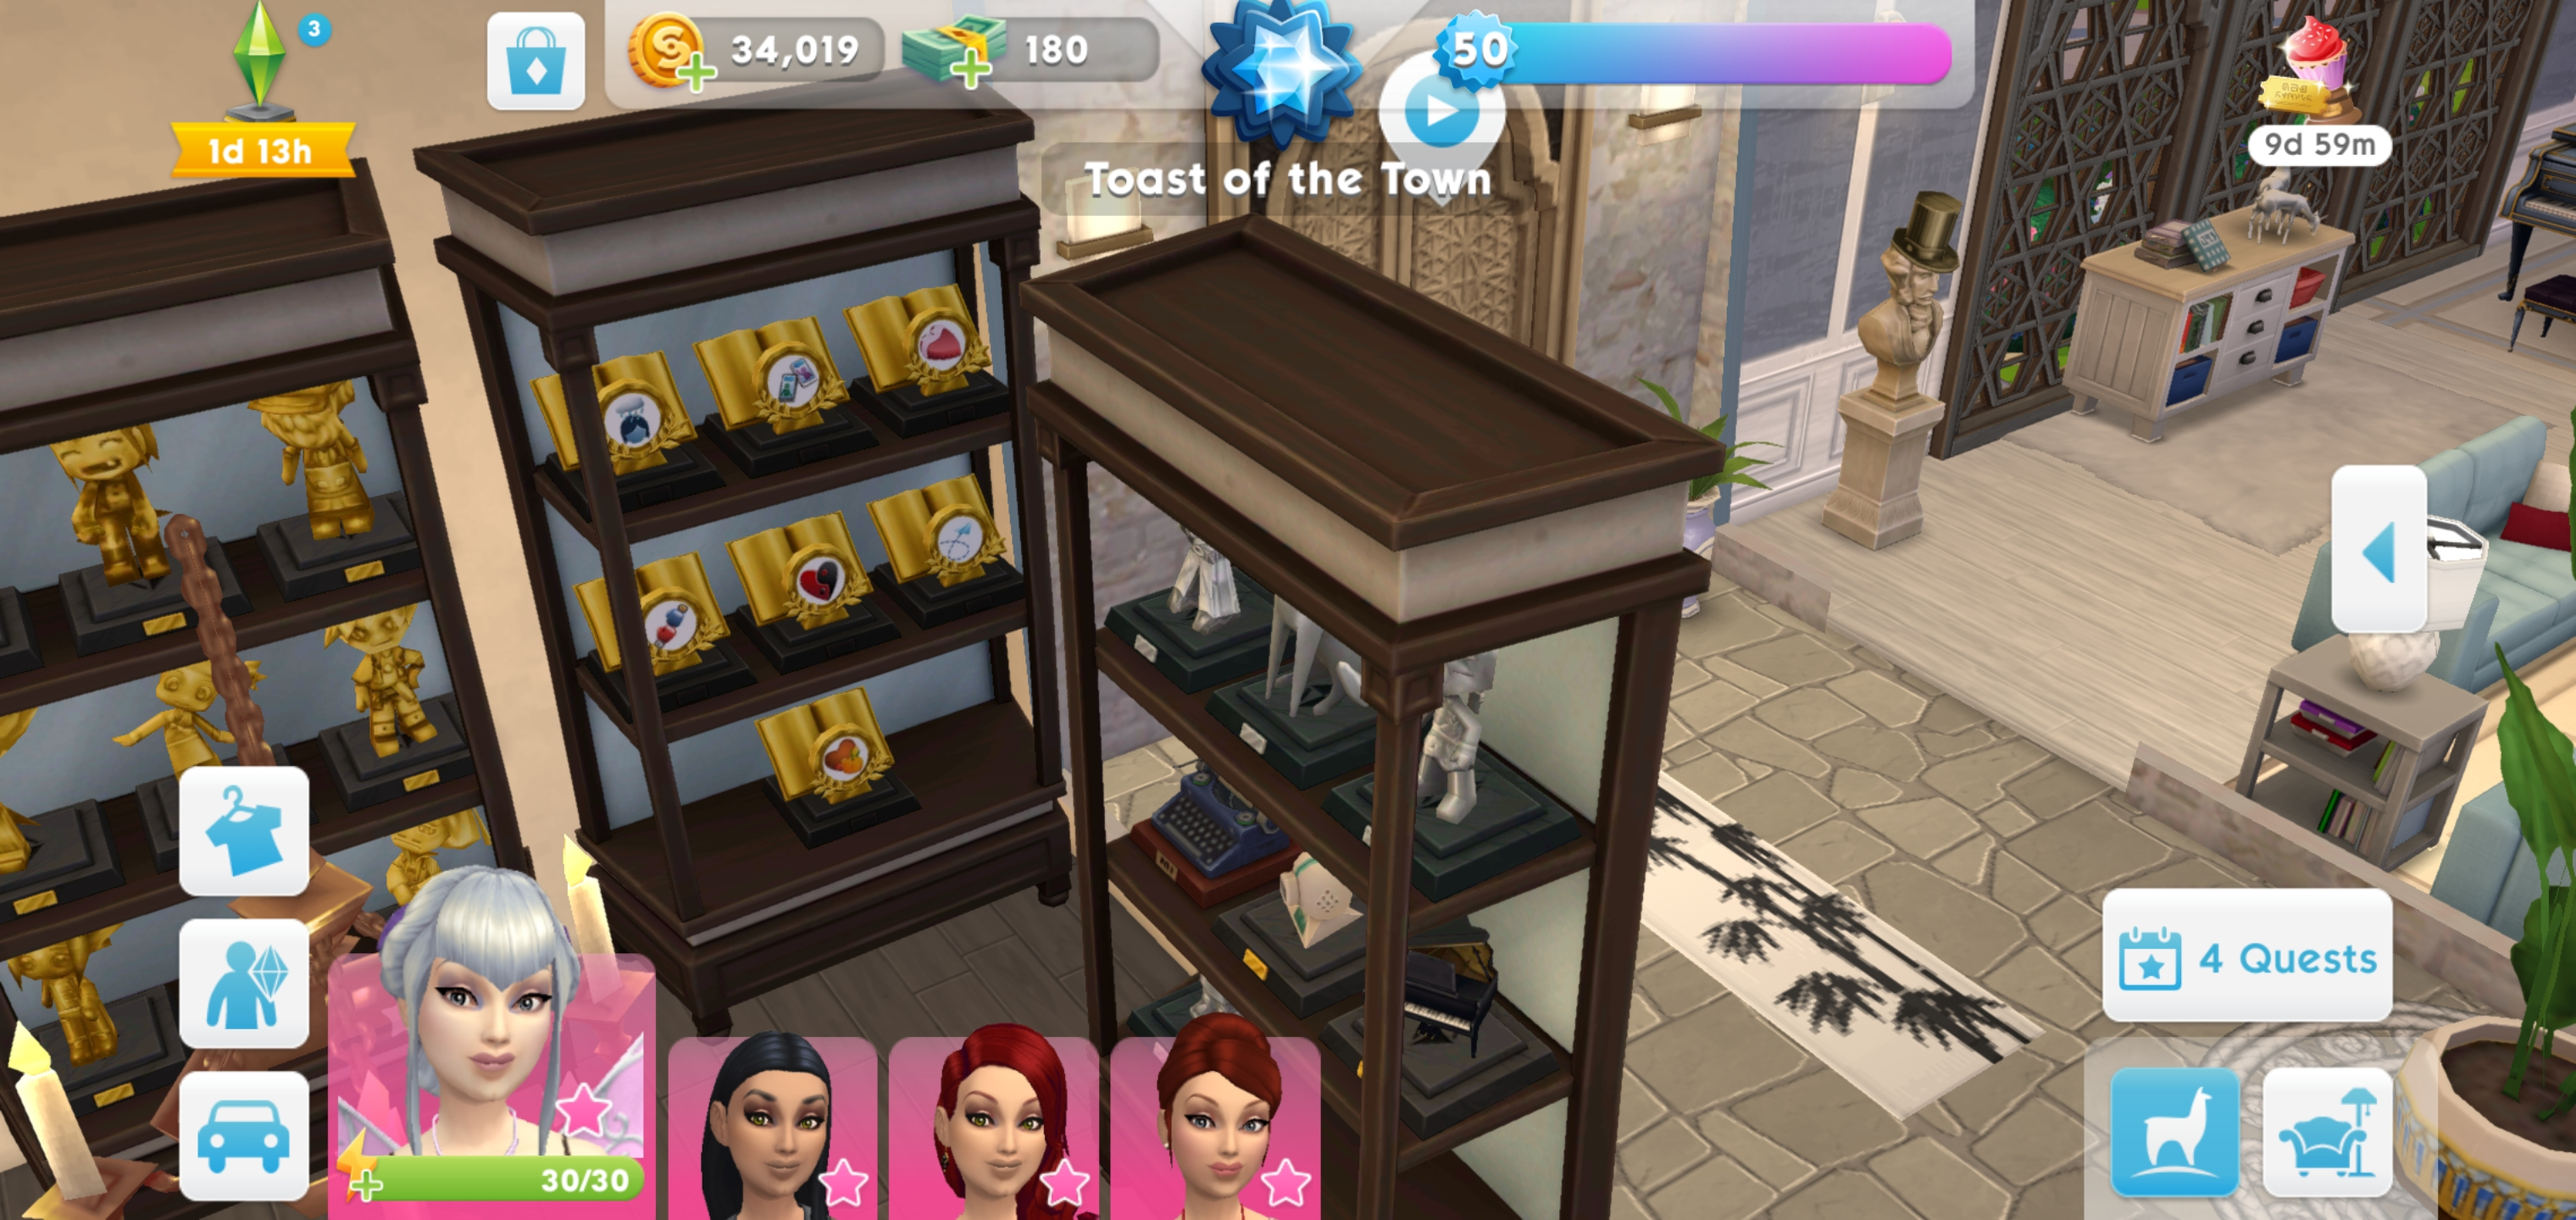 Screenshot_20200210-082522_The Sims.jpg